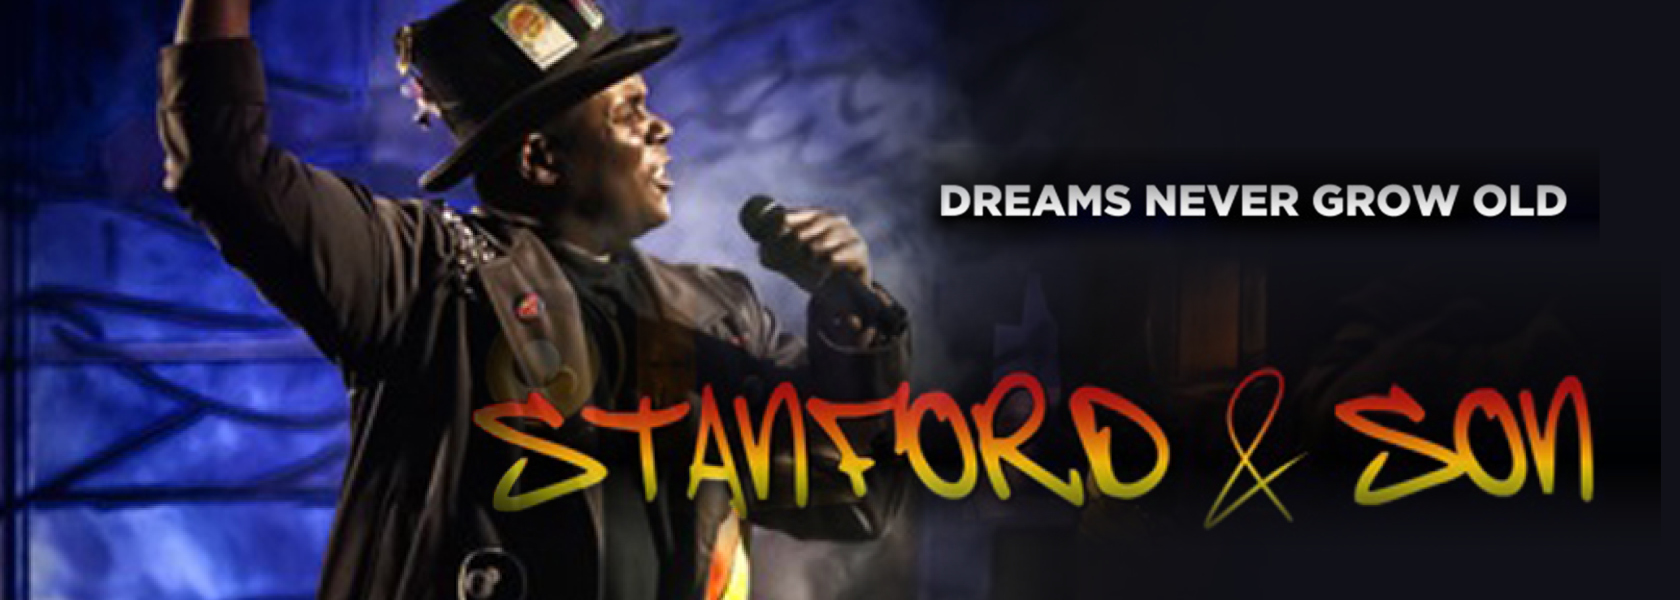 Stanford & Son